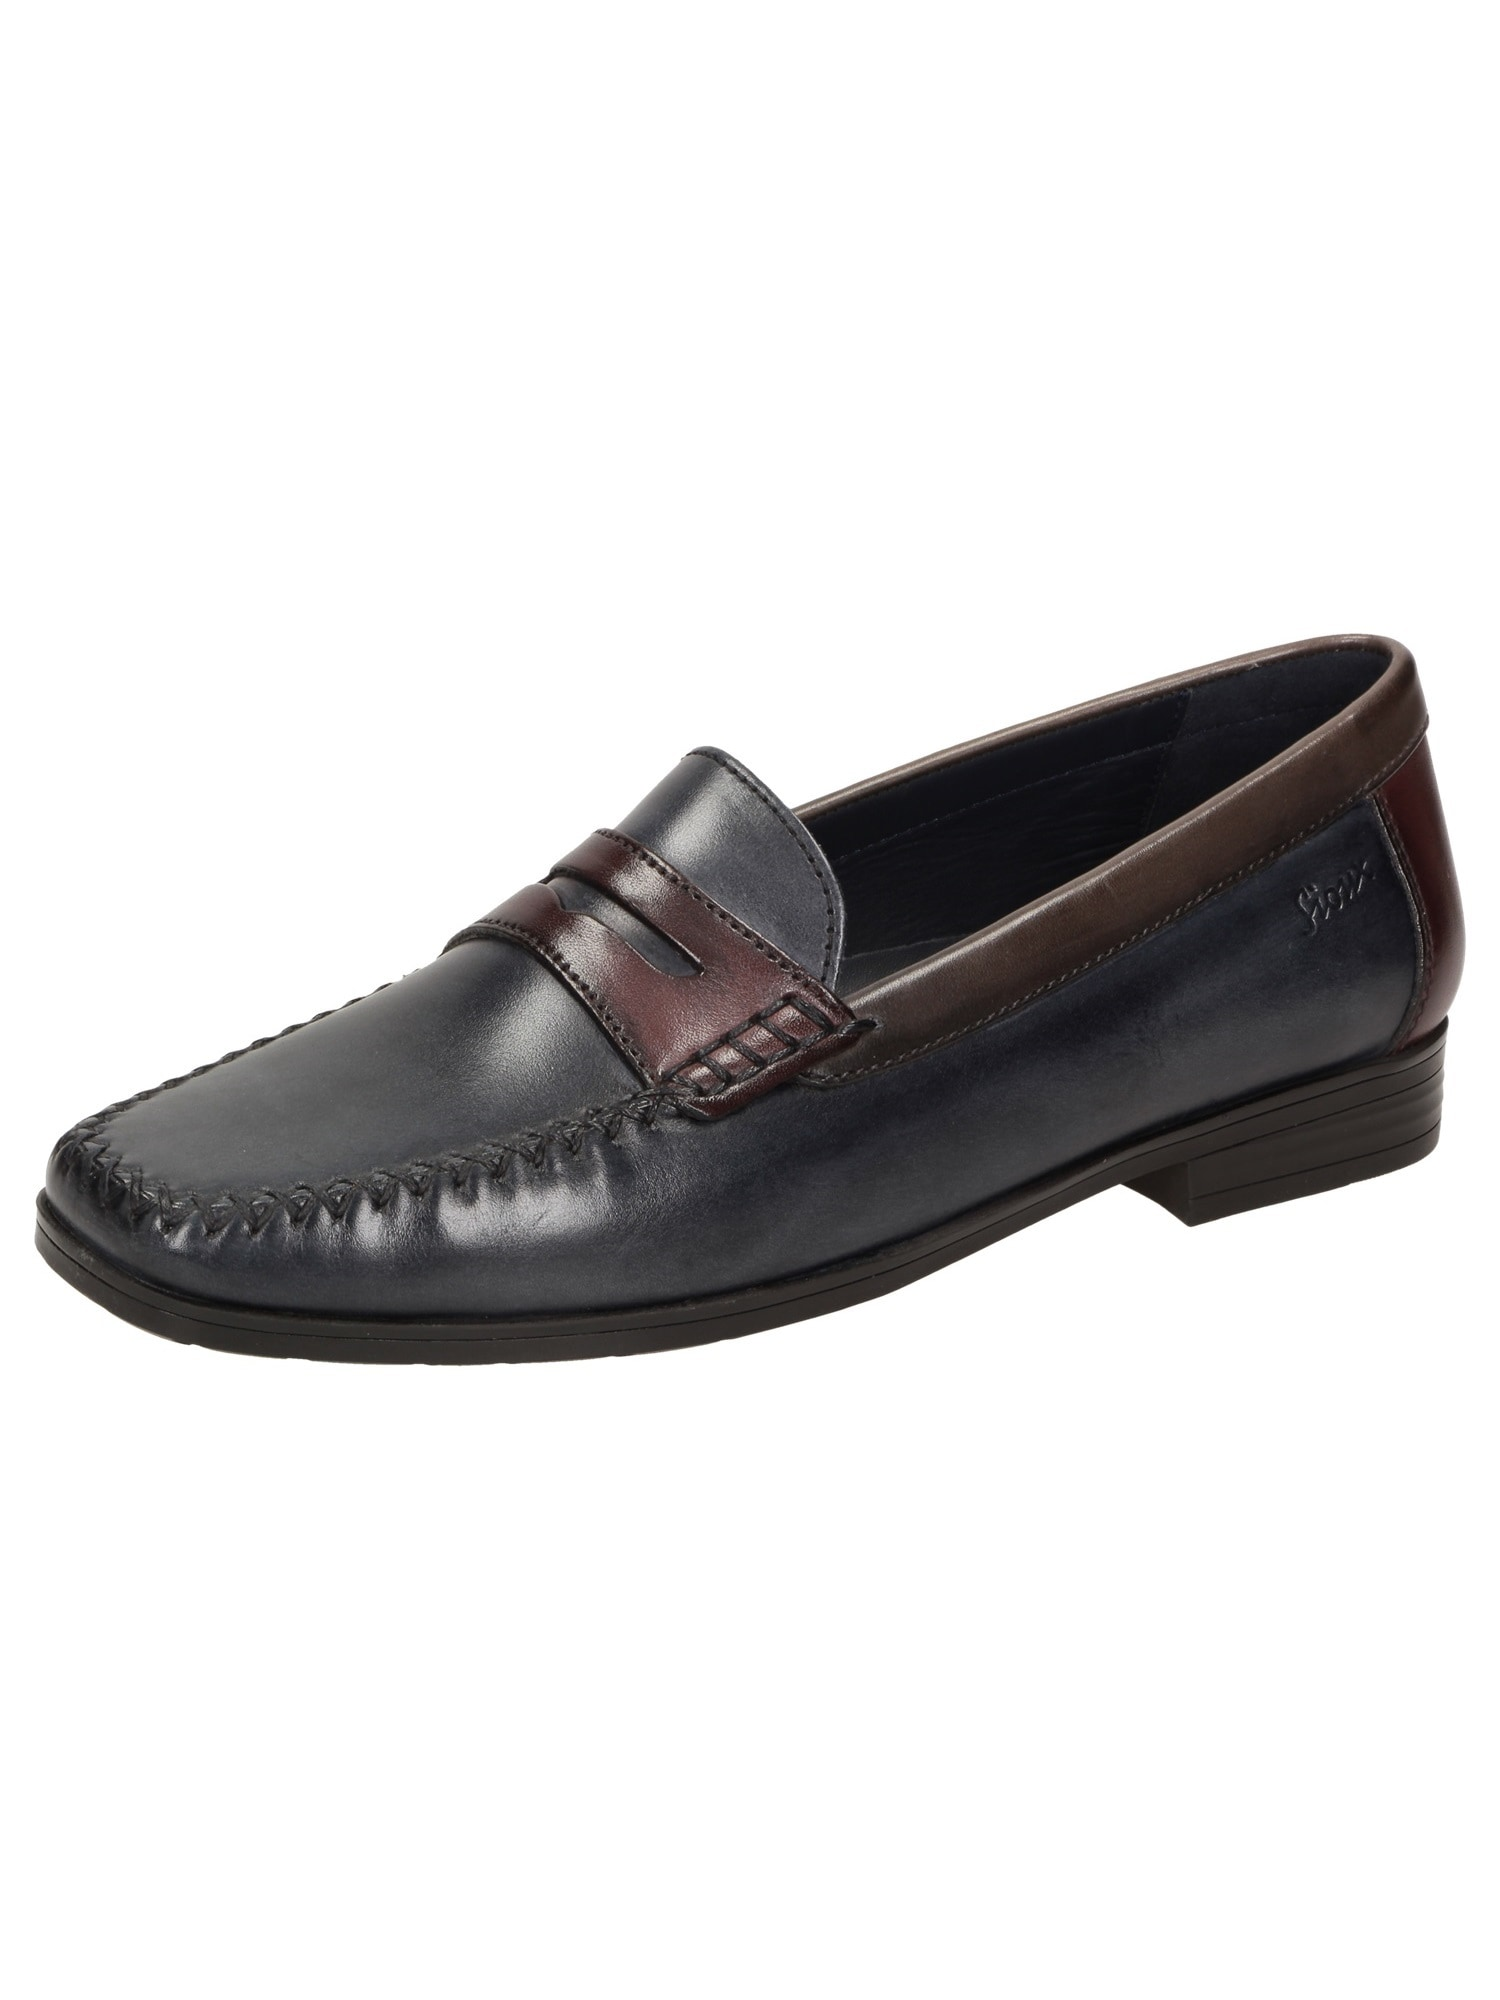 Mokassin 'Cortizia' | Schuhe > Mokassins | Braun - Schwarz | SIOUX